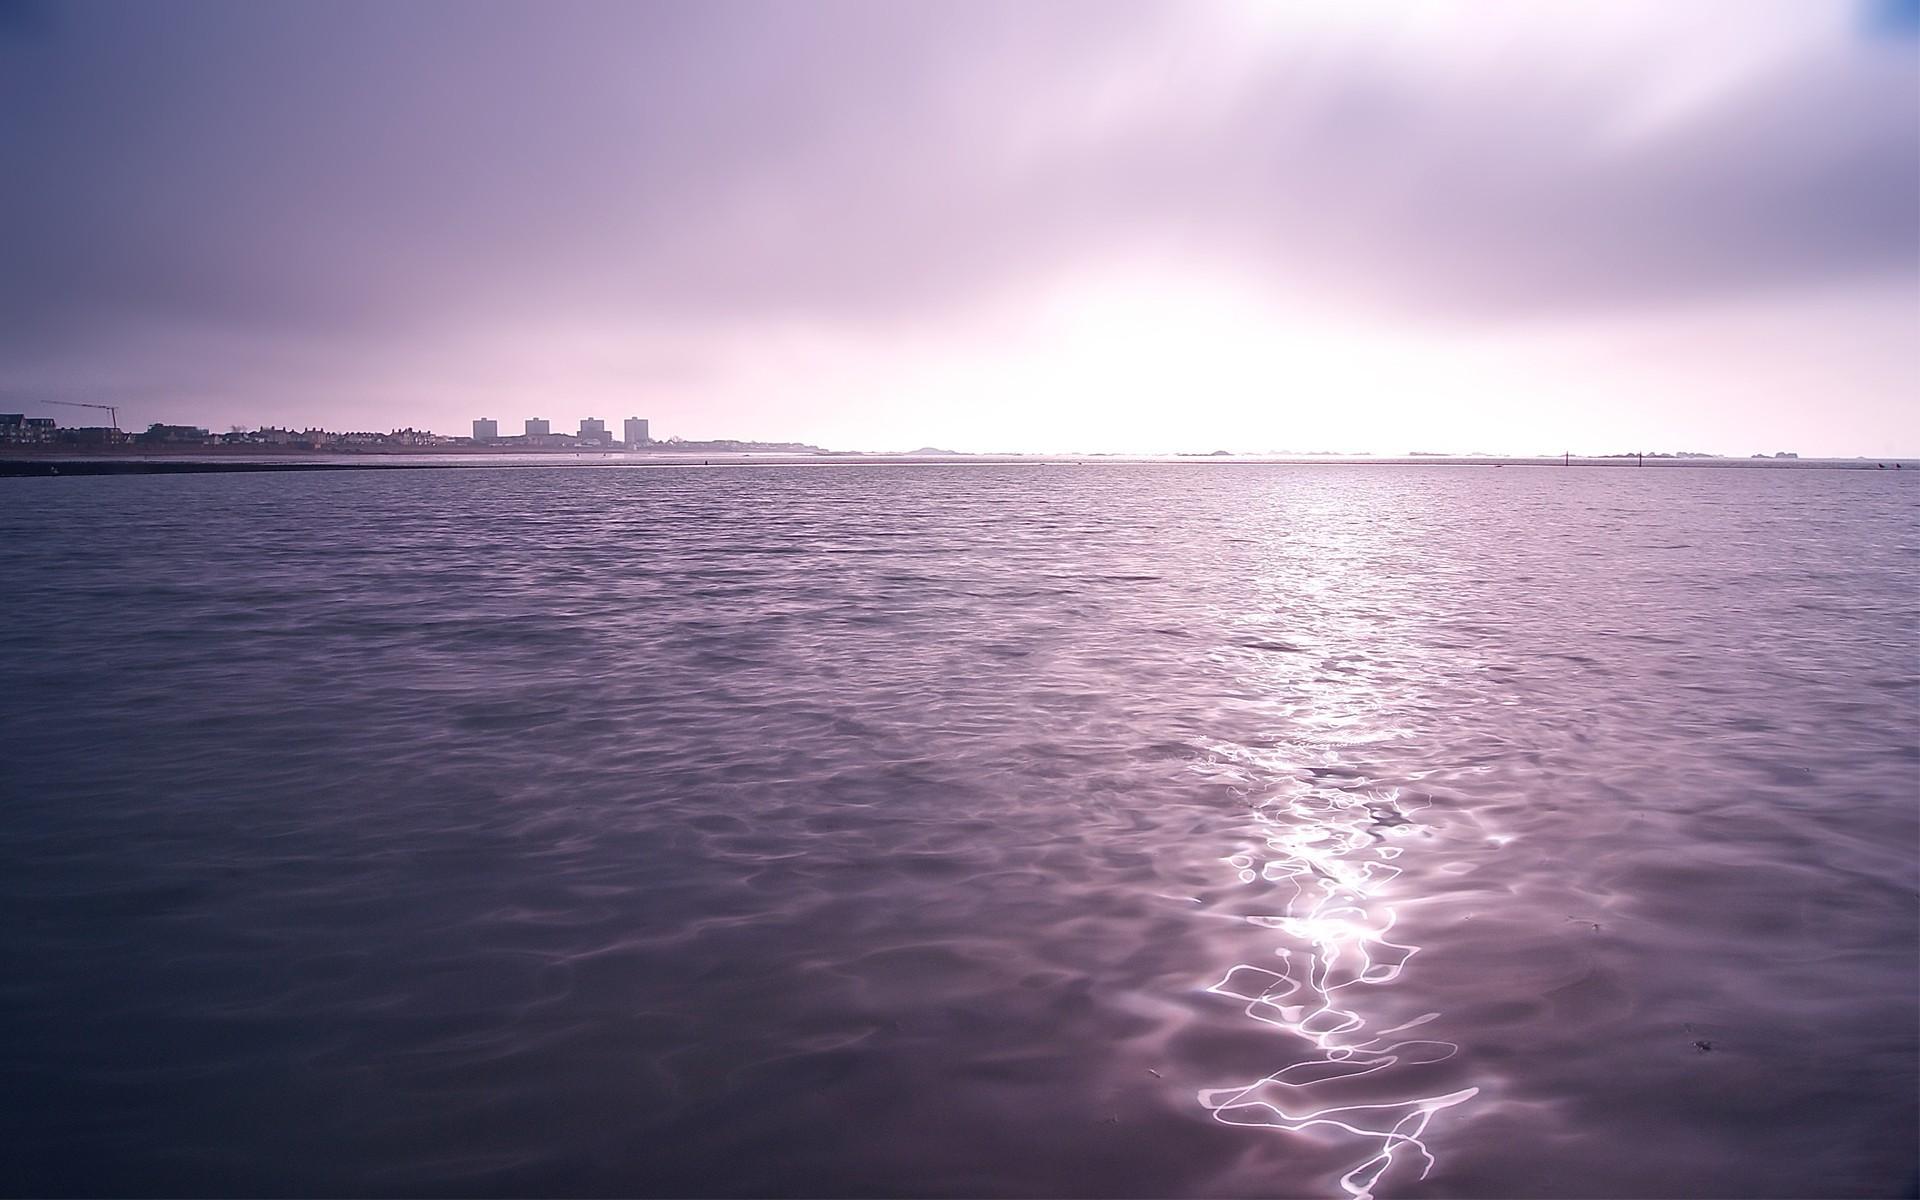 Purple Ocean Wallpapers Download at